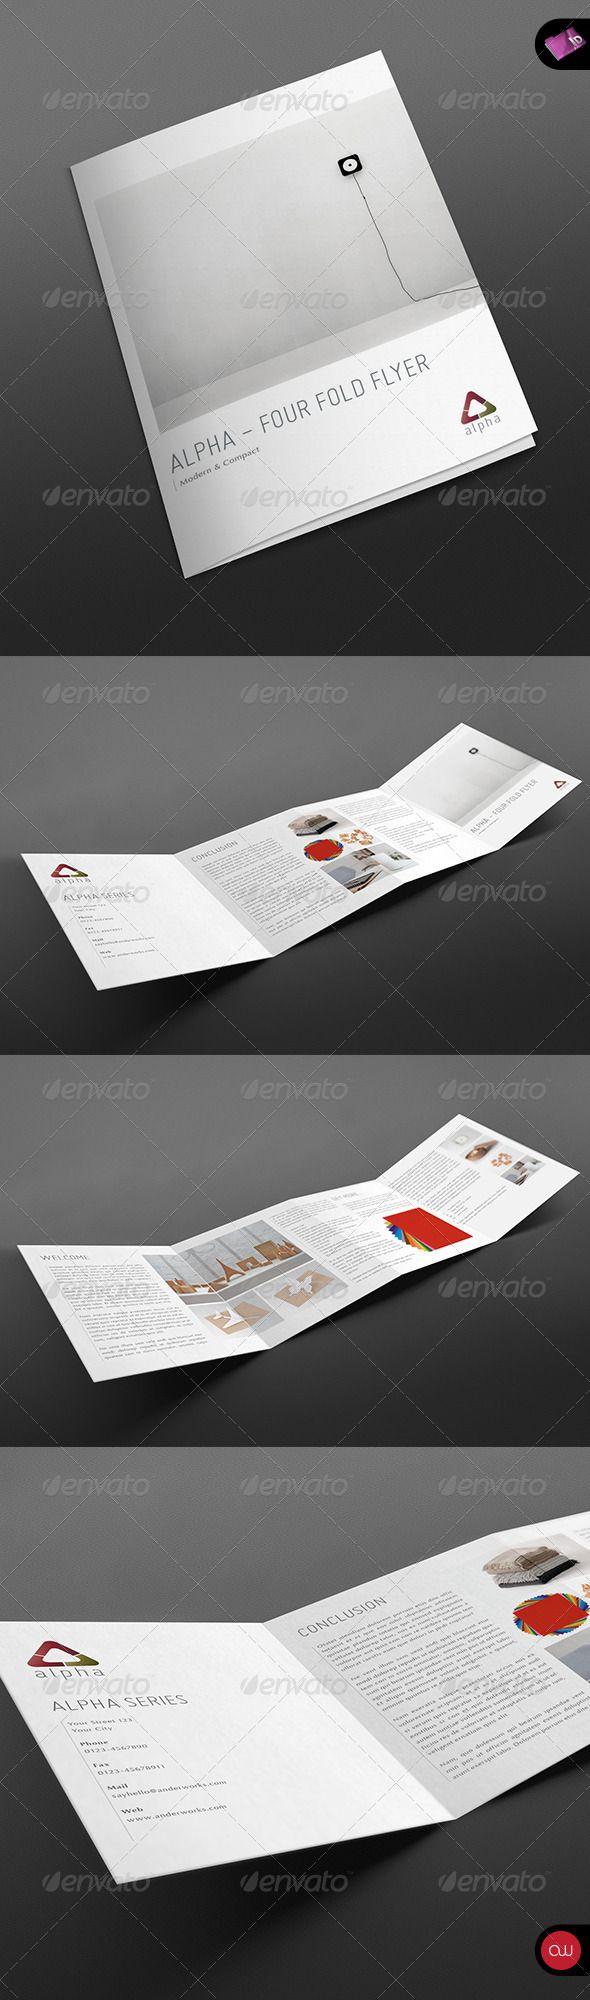 4 Fold Brochure Alpha Series Brochure Template Brochure Folds Brochure